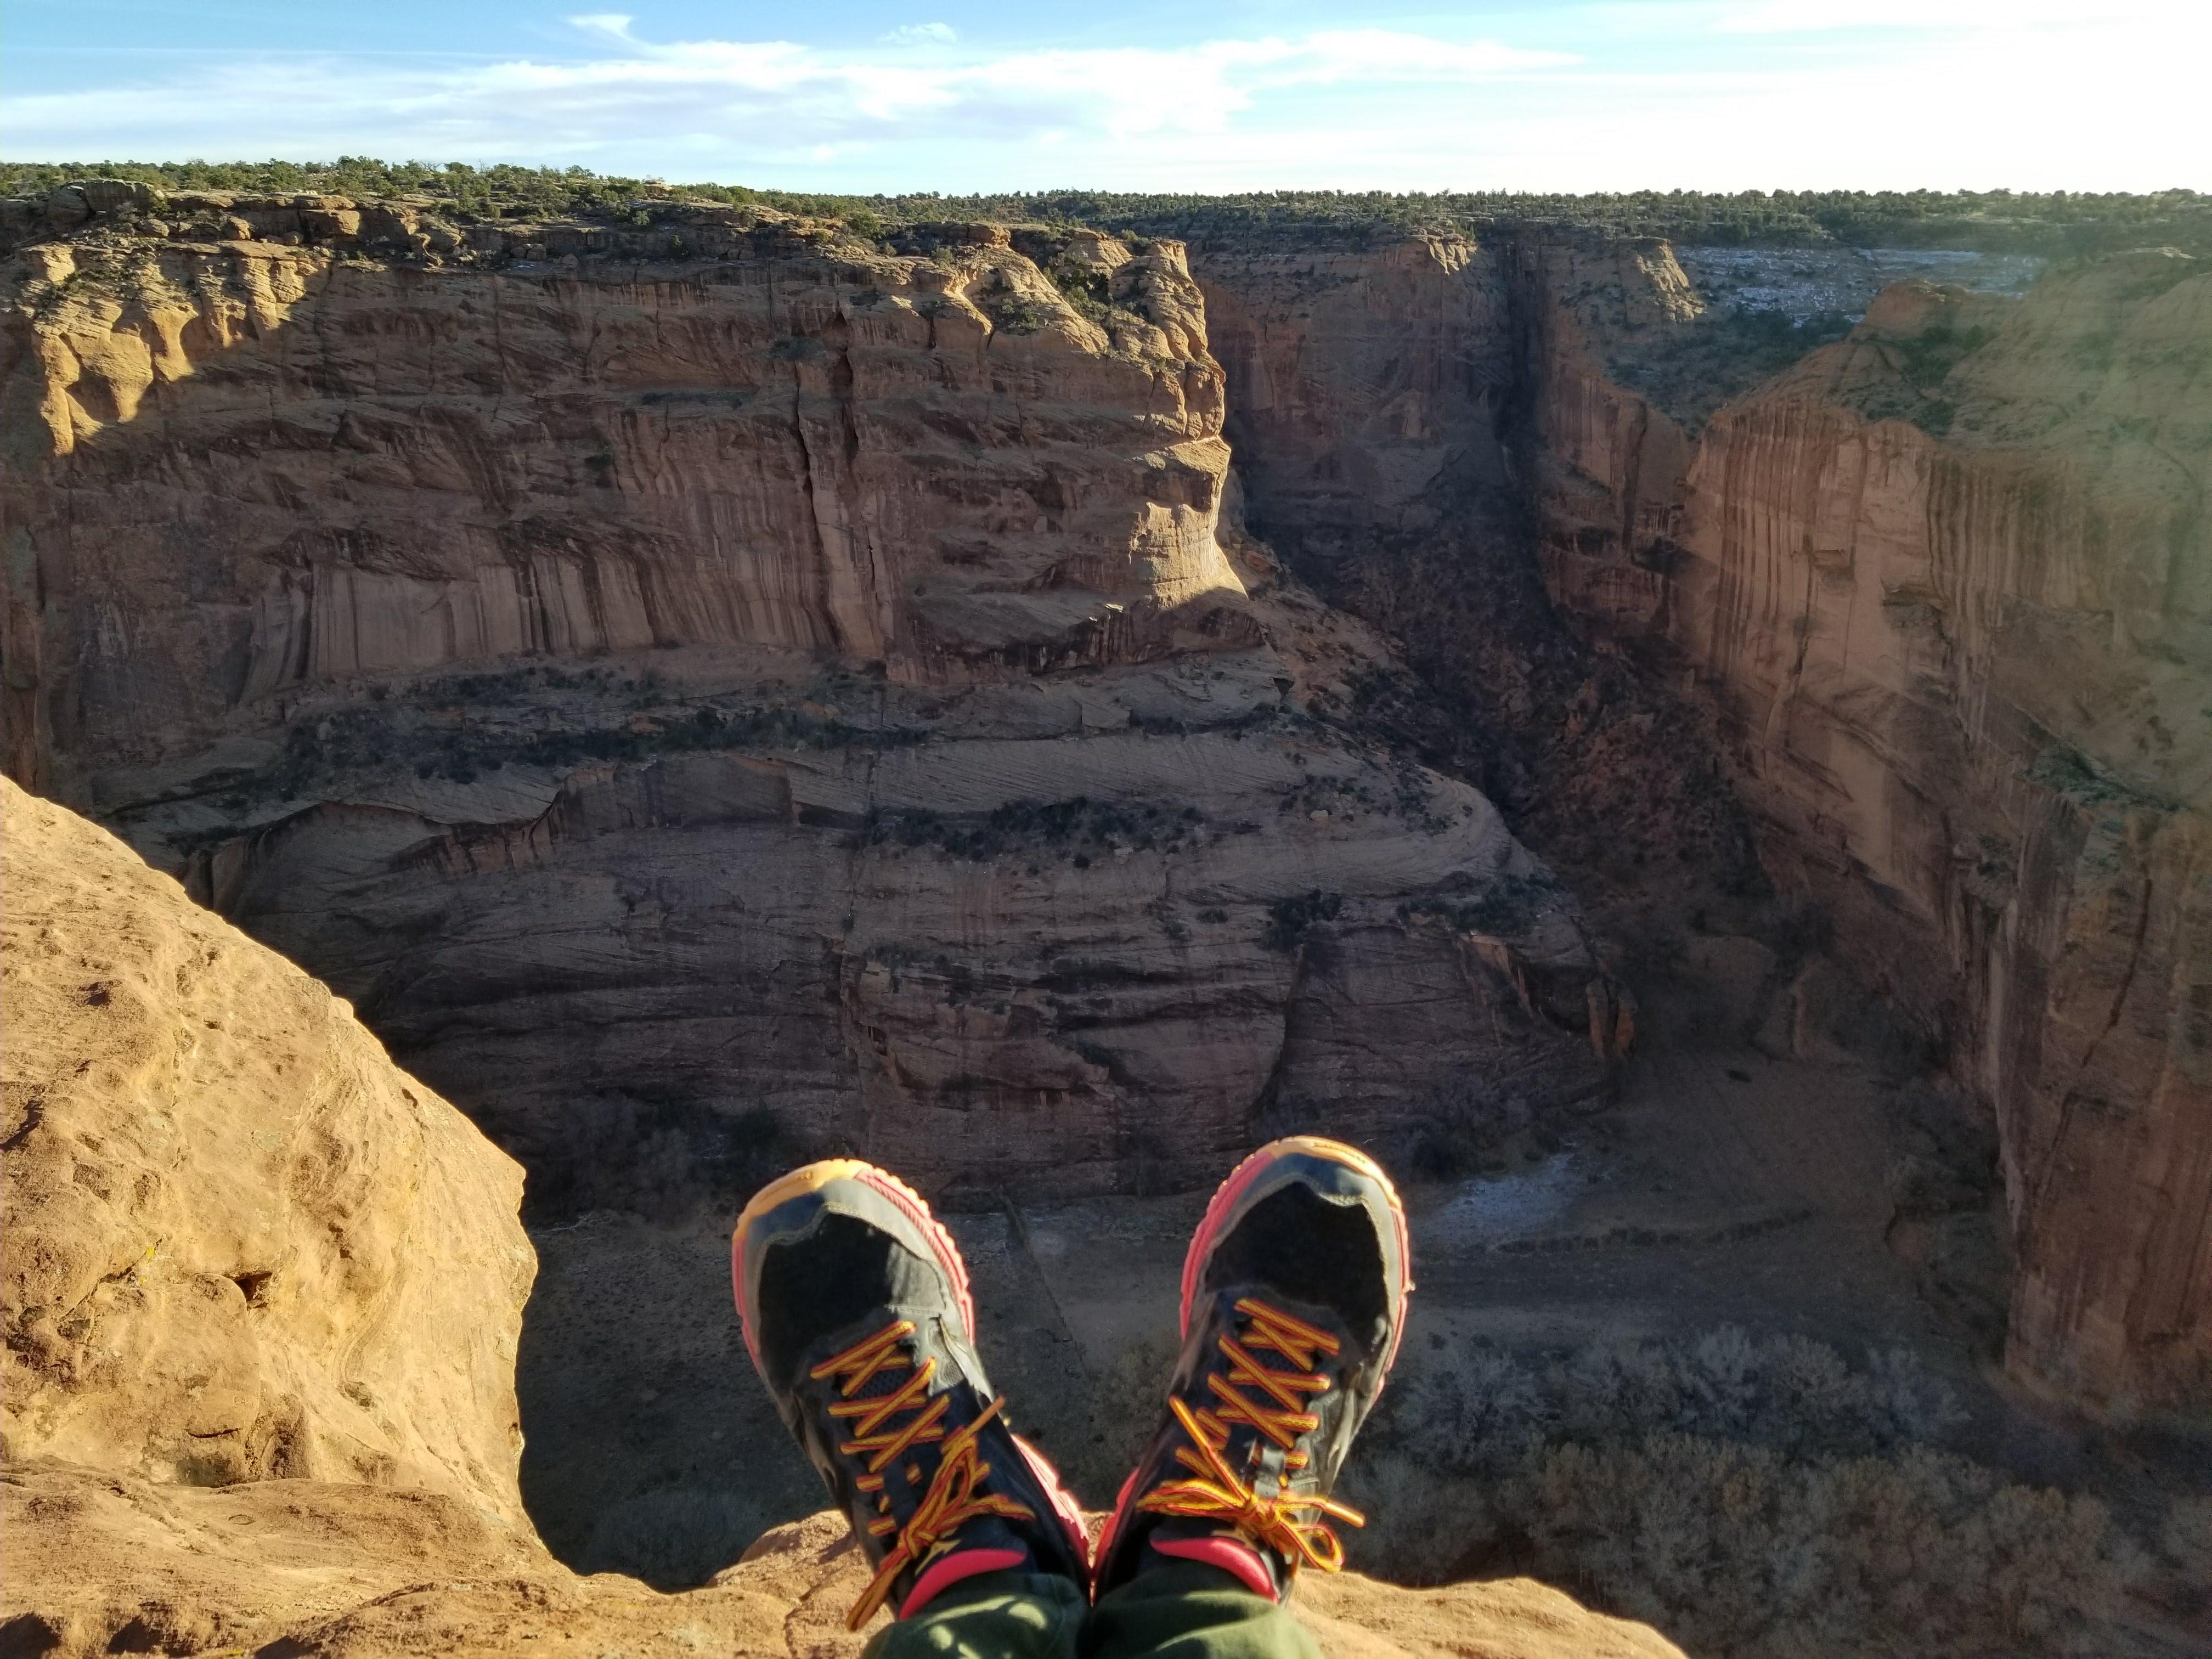 Adventuring for Positive Change: Meet Kristin Pulatie